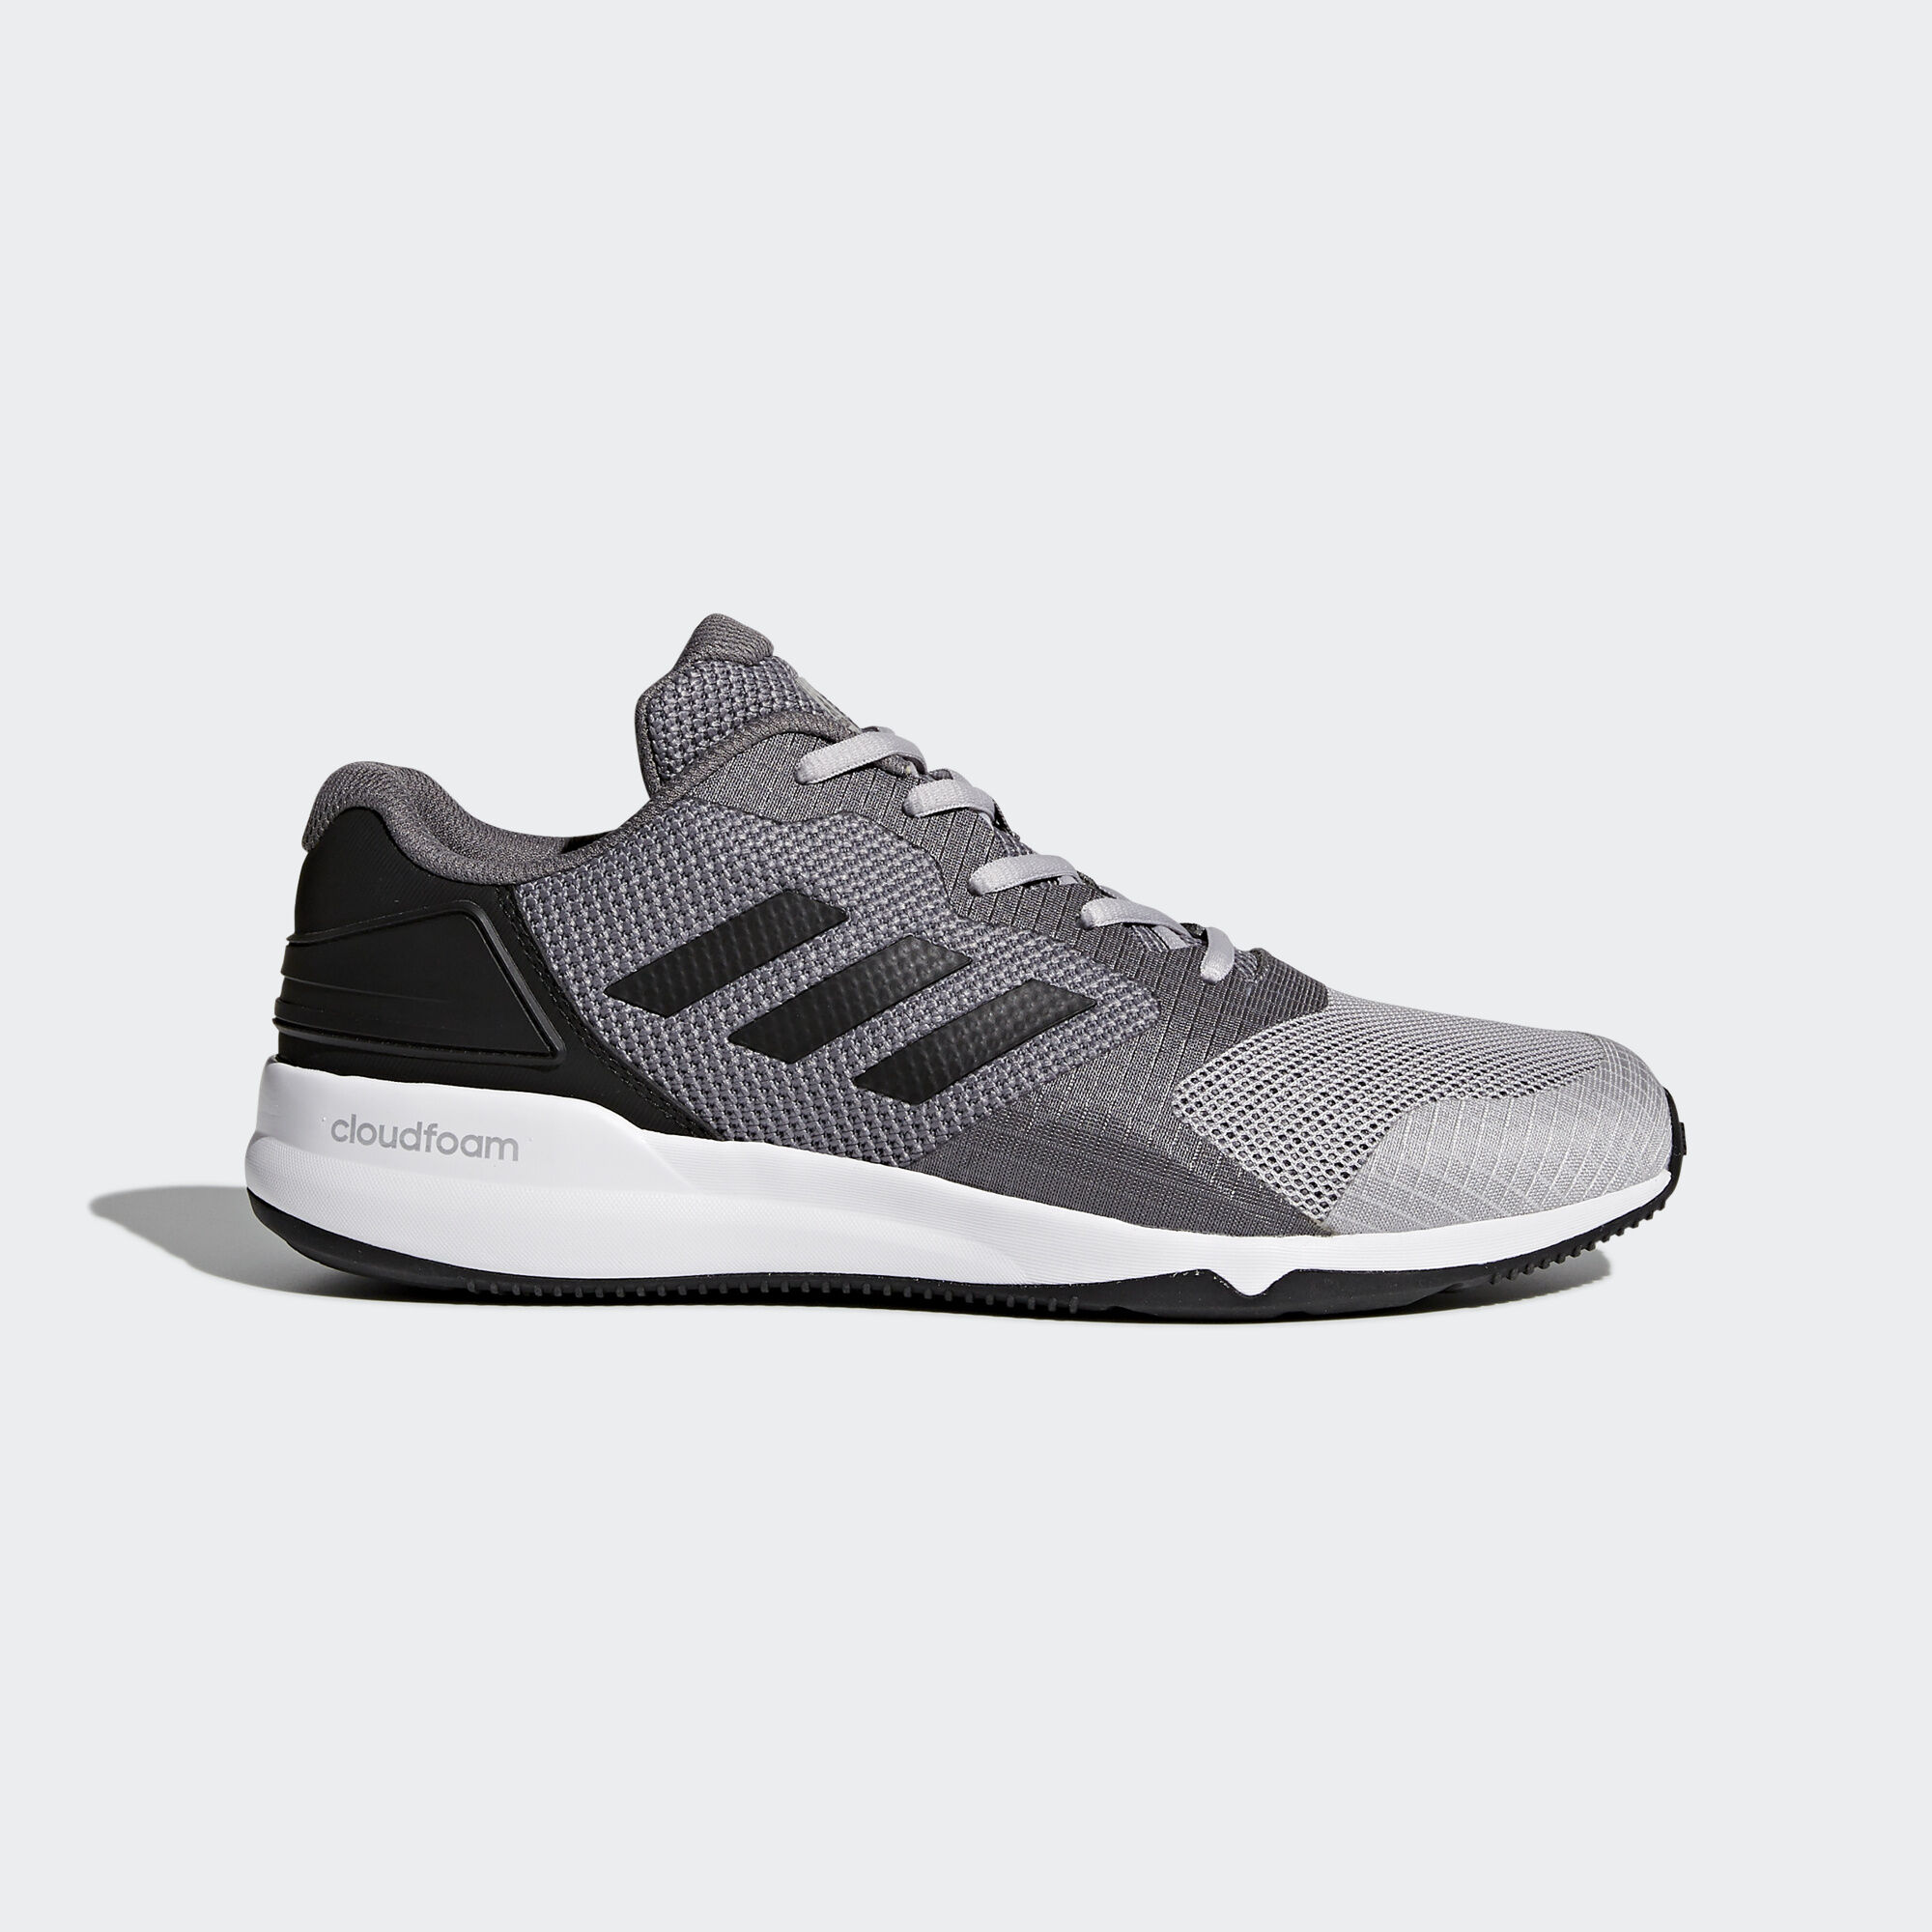 adidas cloudfoam trainers grey